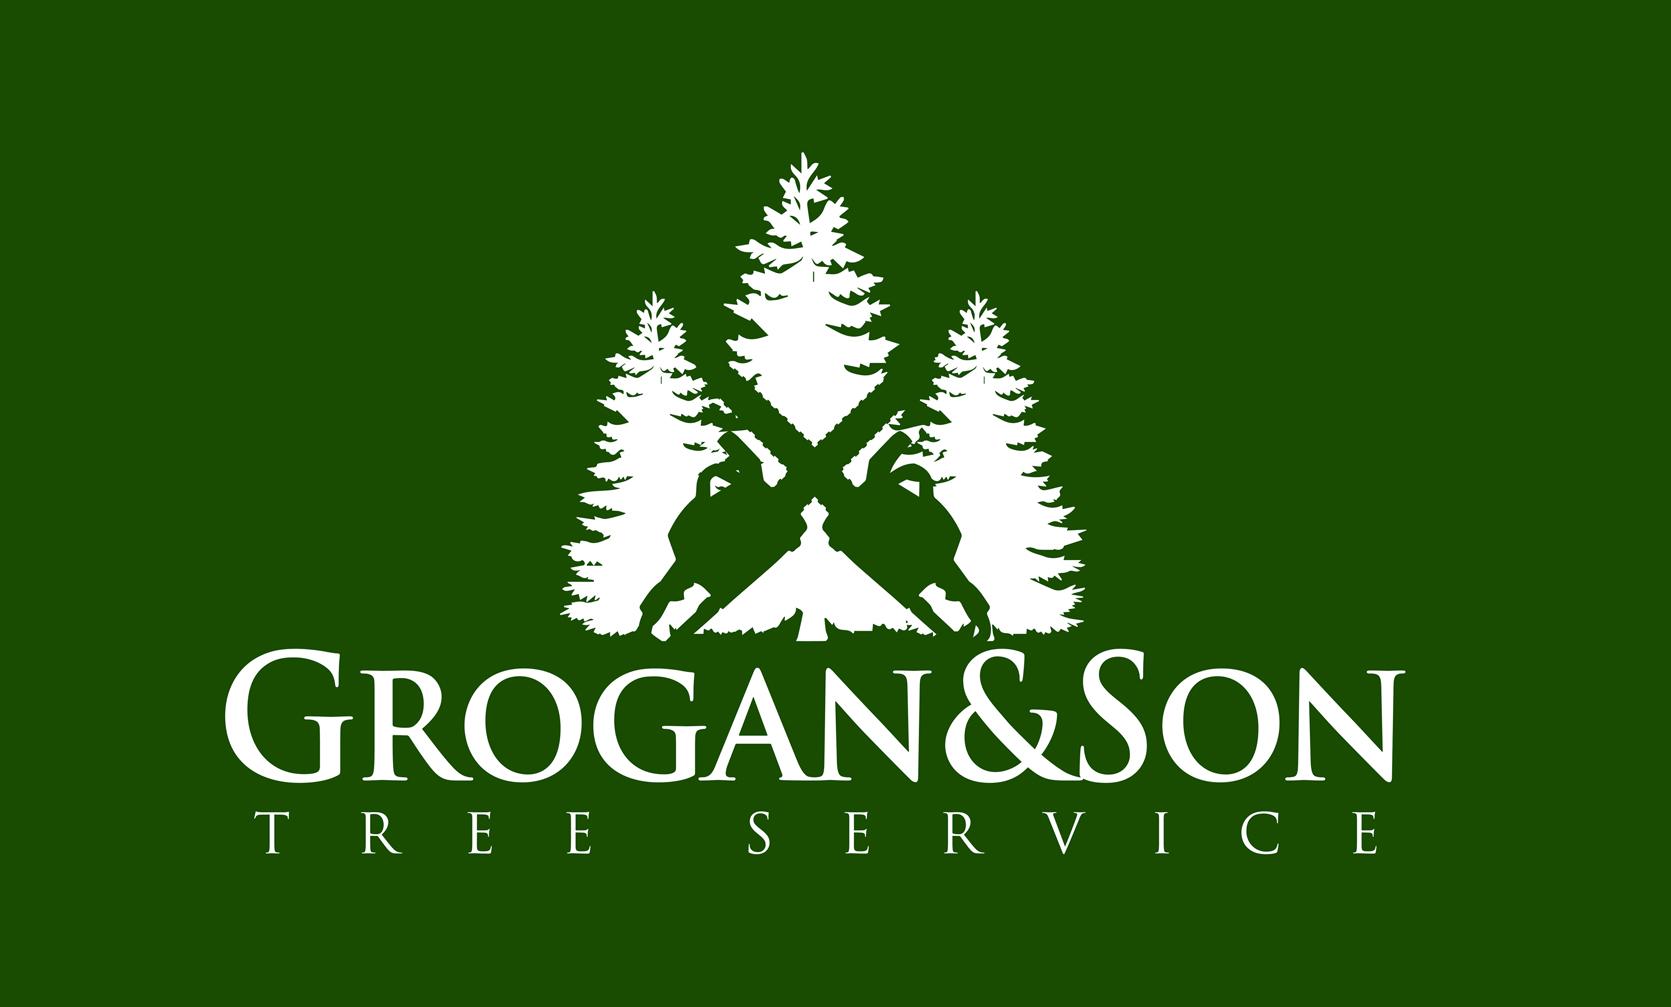 Grogan Son Tree Service Home